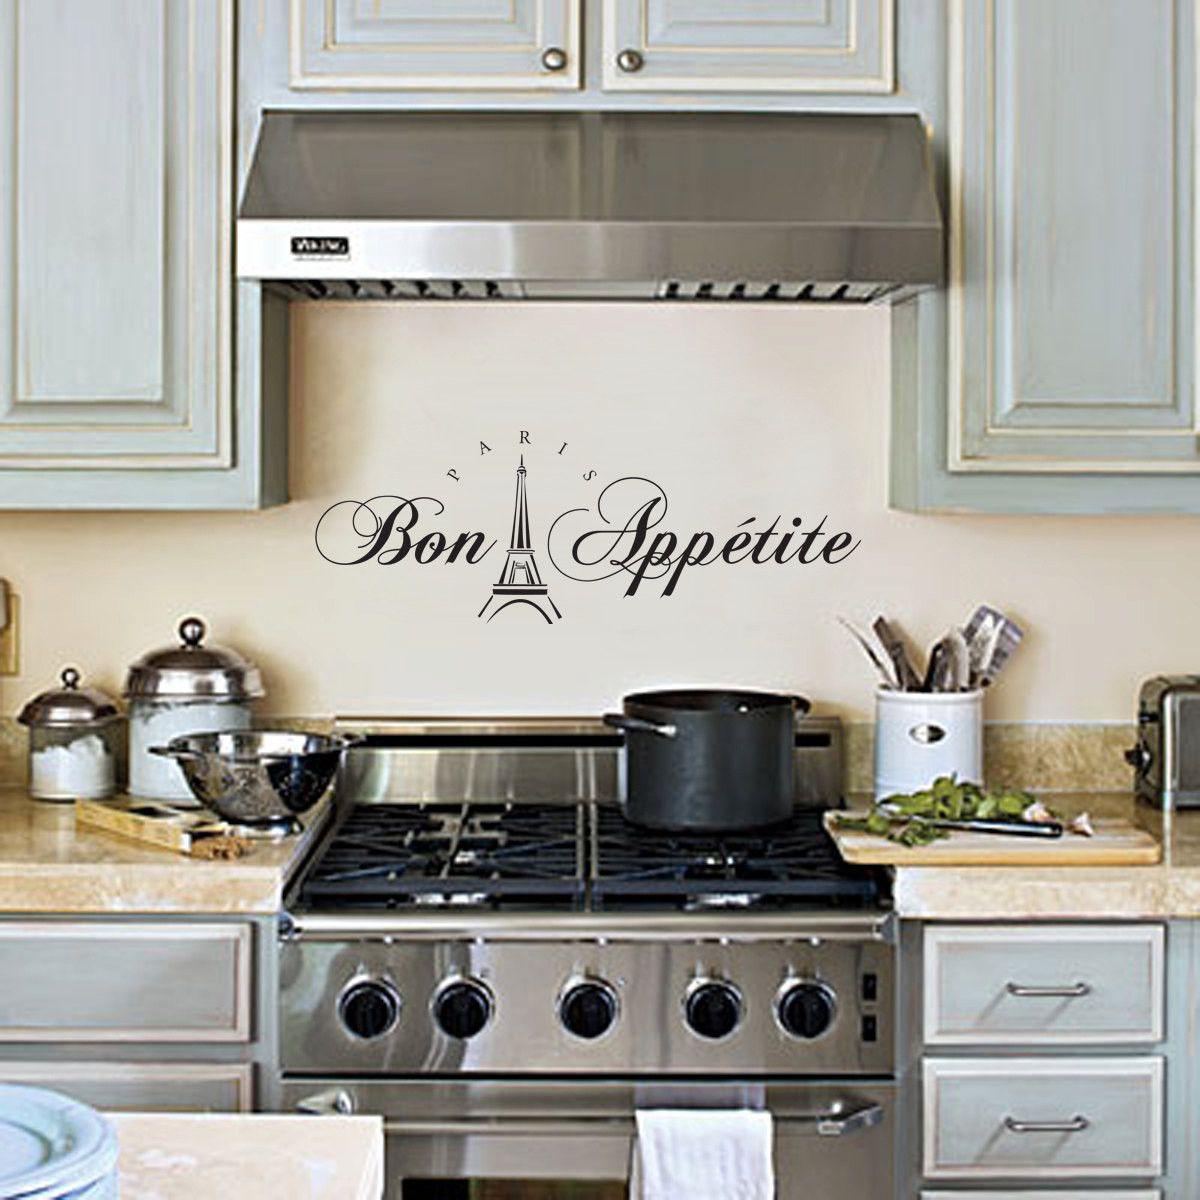 bon appetit wall decal paris kitchen wall decor wall art wall sticker for the kitchen 24x10 on kitchen decor wall ideas id=41573